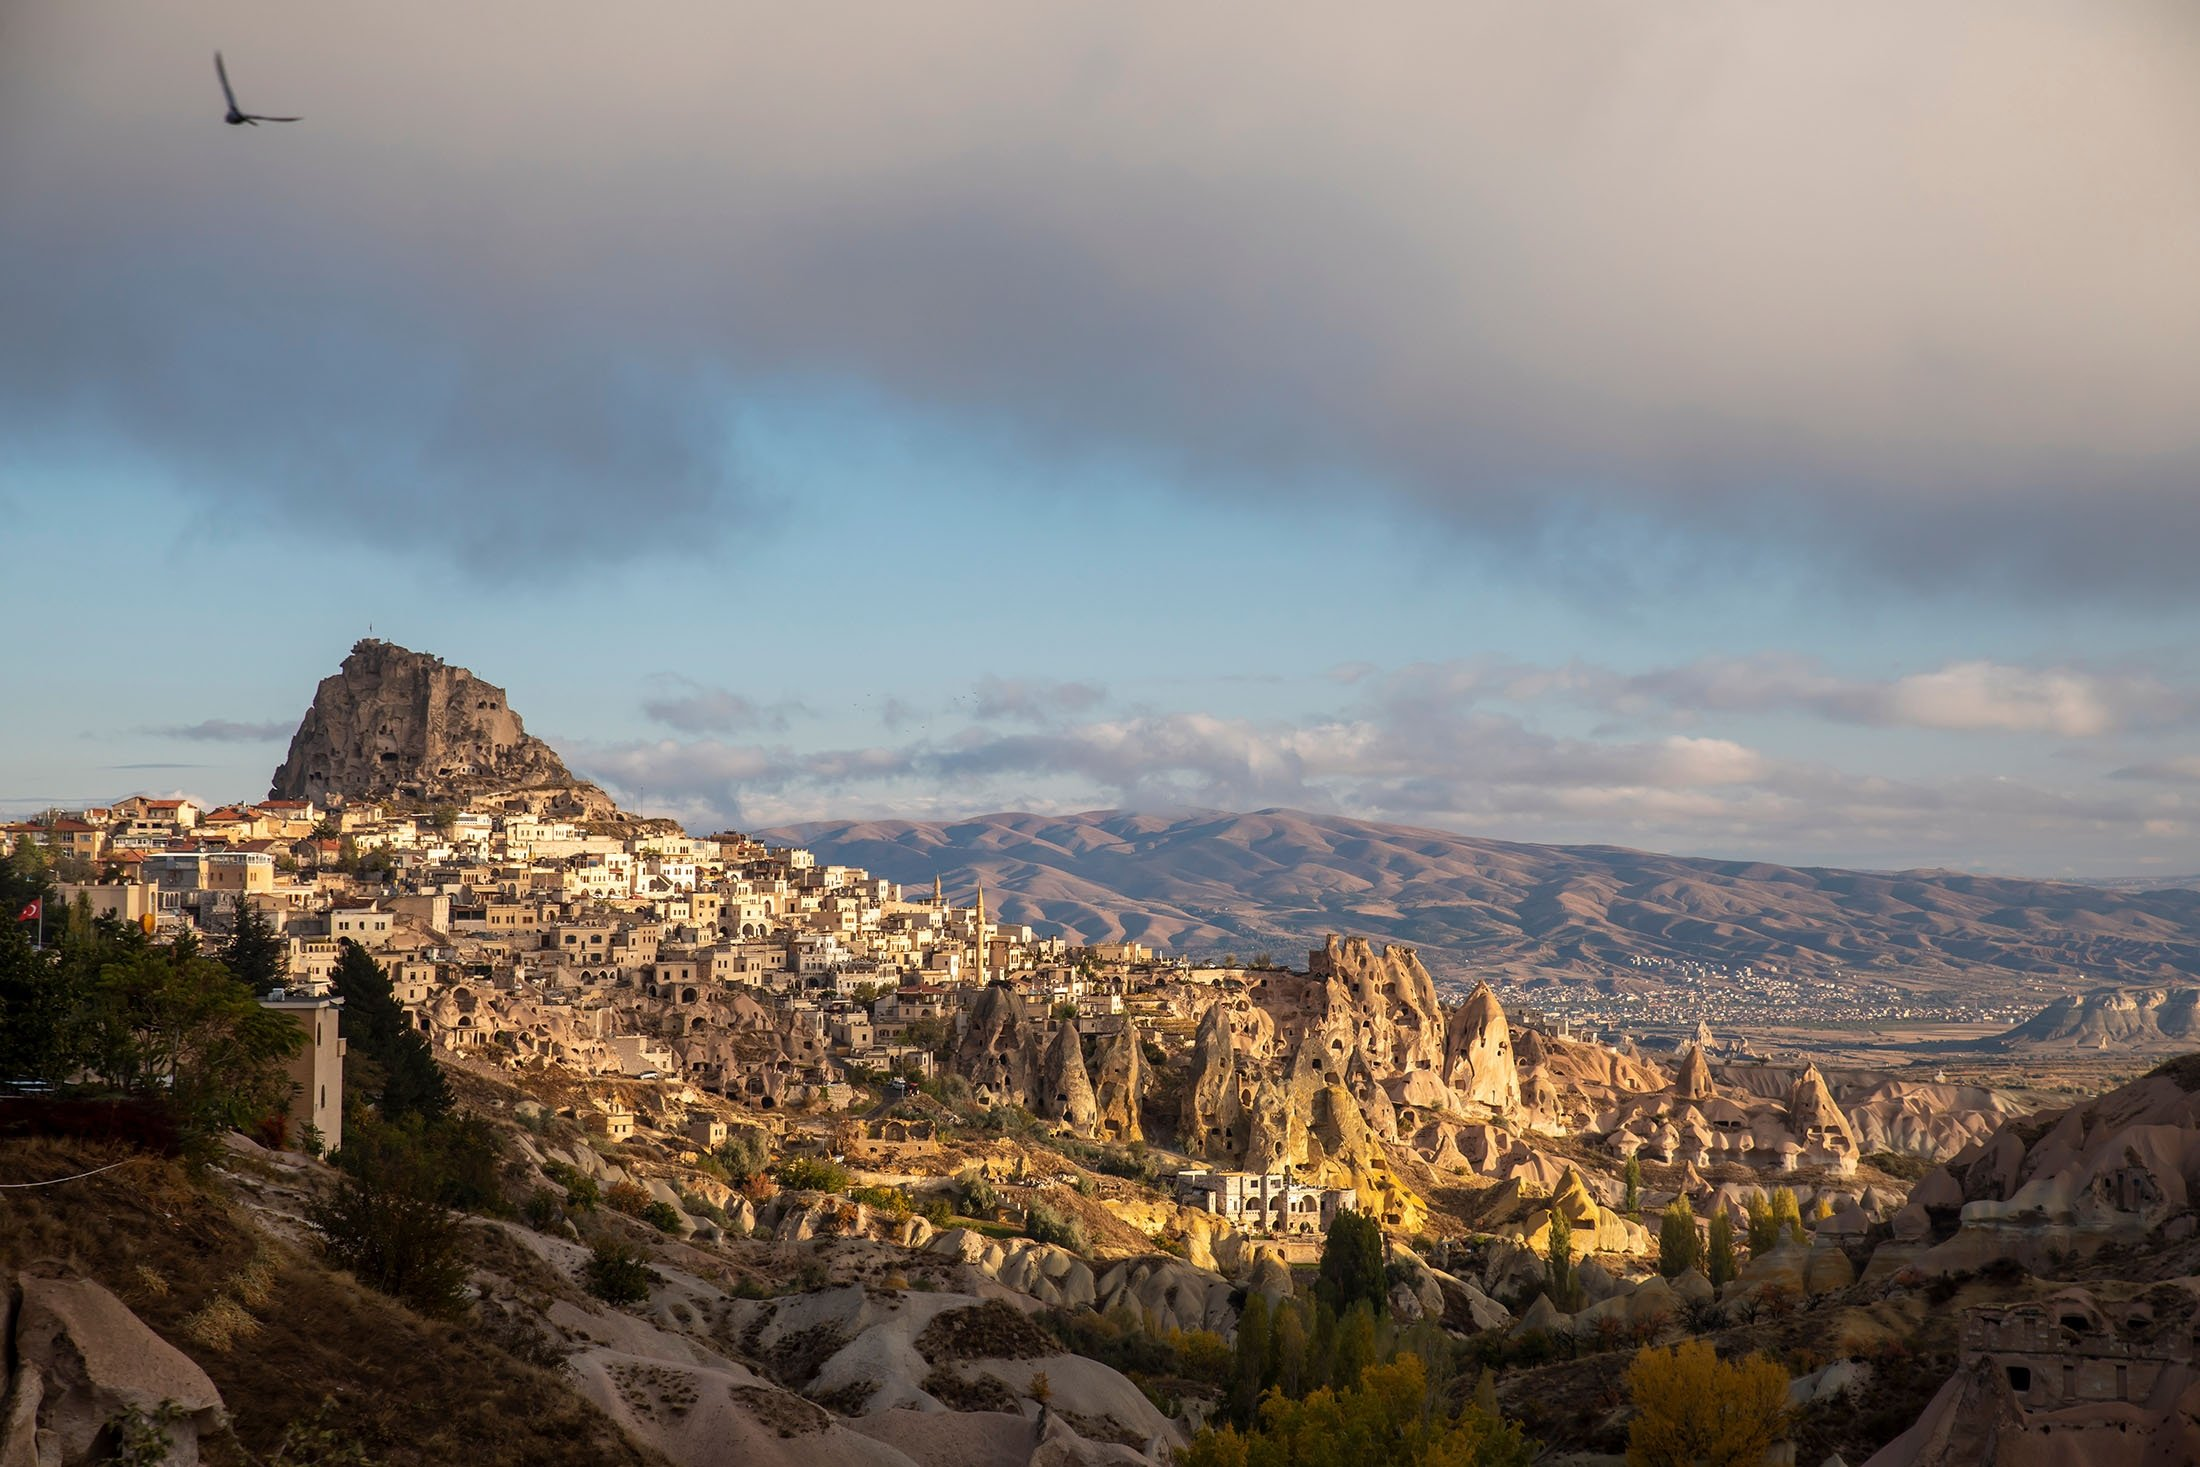 The Uçhisar settlement and castle in Nevşehir, Turkey. (Shutterstock Photo)